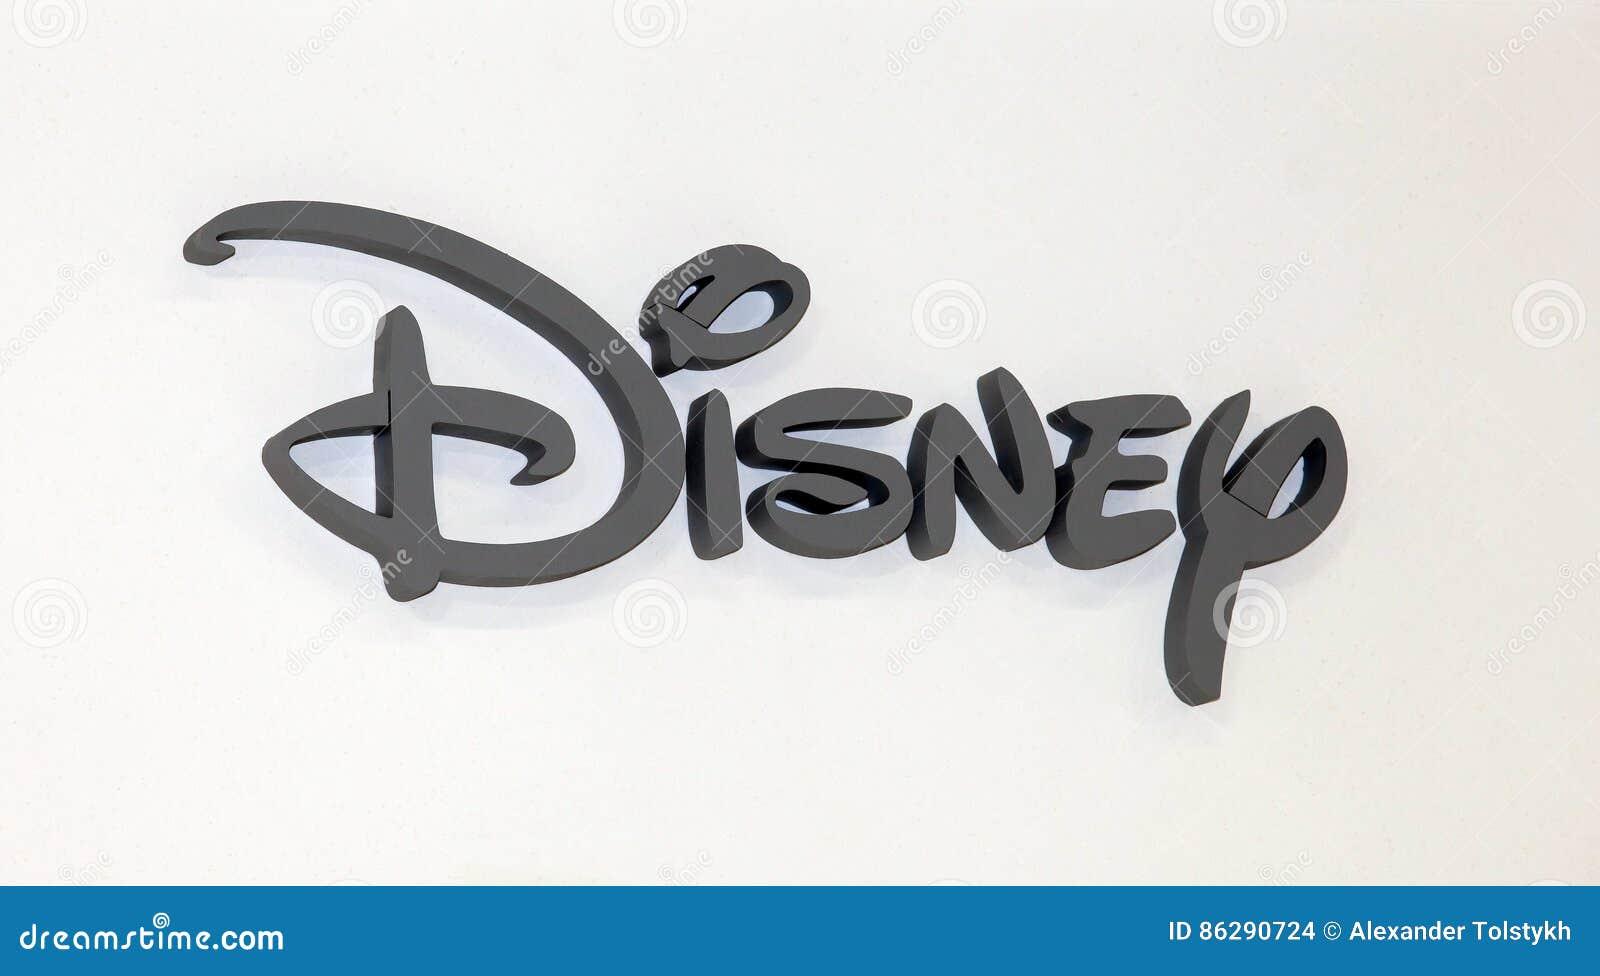 Disney company logo sign grey plastic letters on the white wall disney company logo sign grey plastic letters on the white wall editorial stock photo biocorpaavc Choice Image